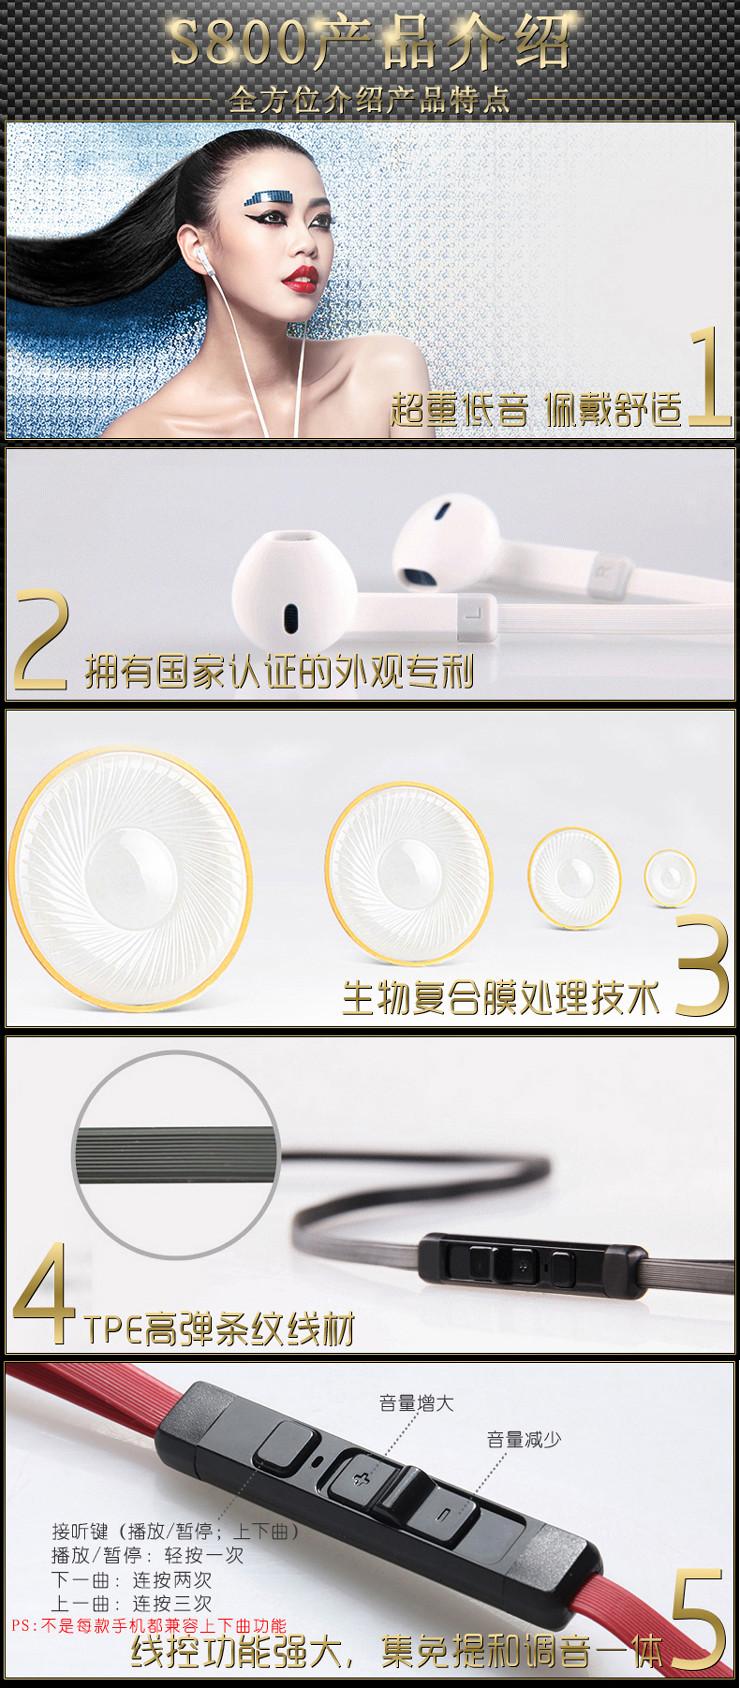 BYZS800耳机手机可调控麦克风音量带线高换手机给系统图片